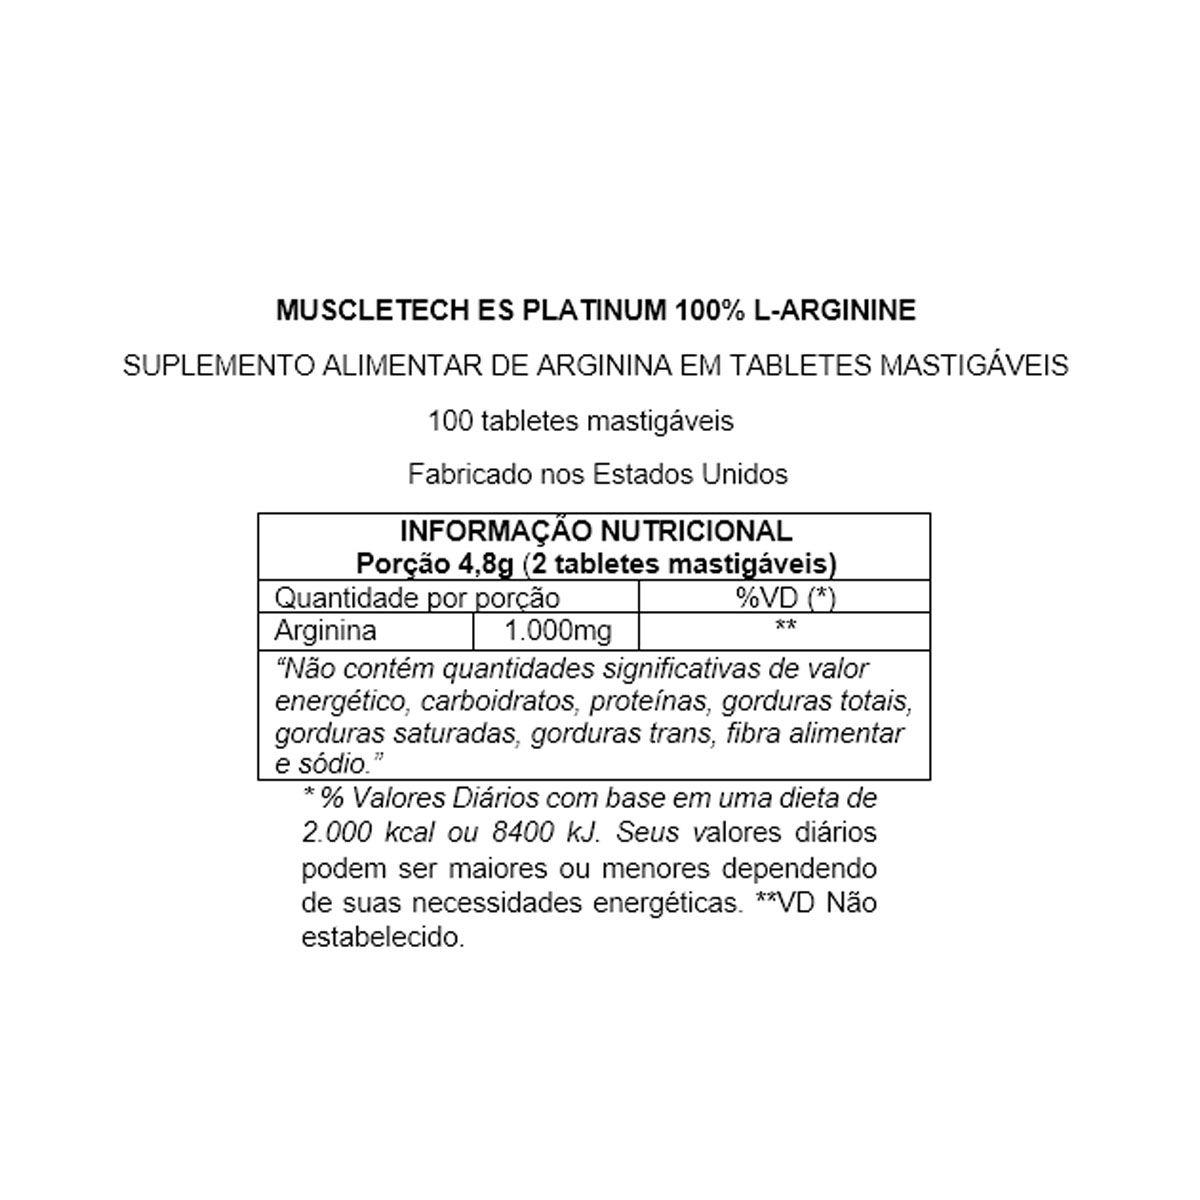 L-Arginina Platinum 100 Tabletes - Muscletech